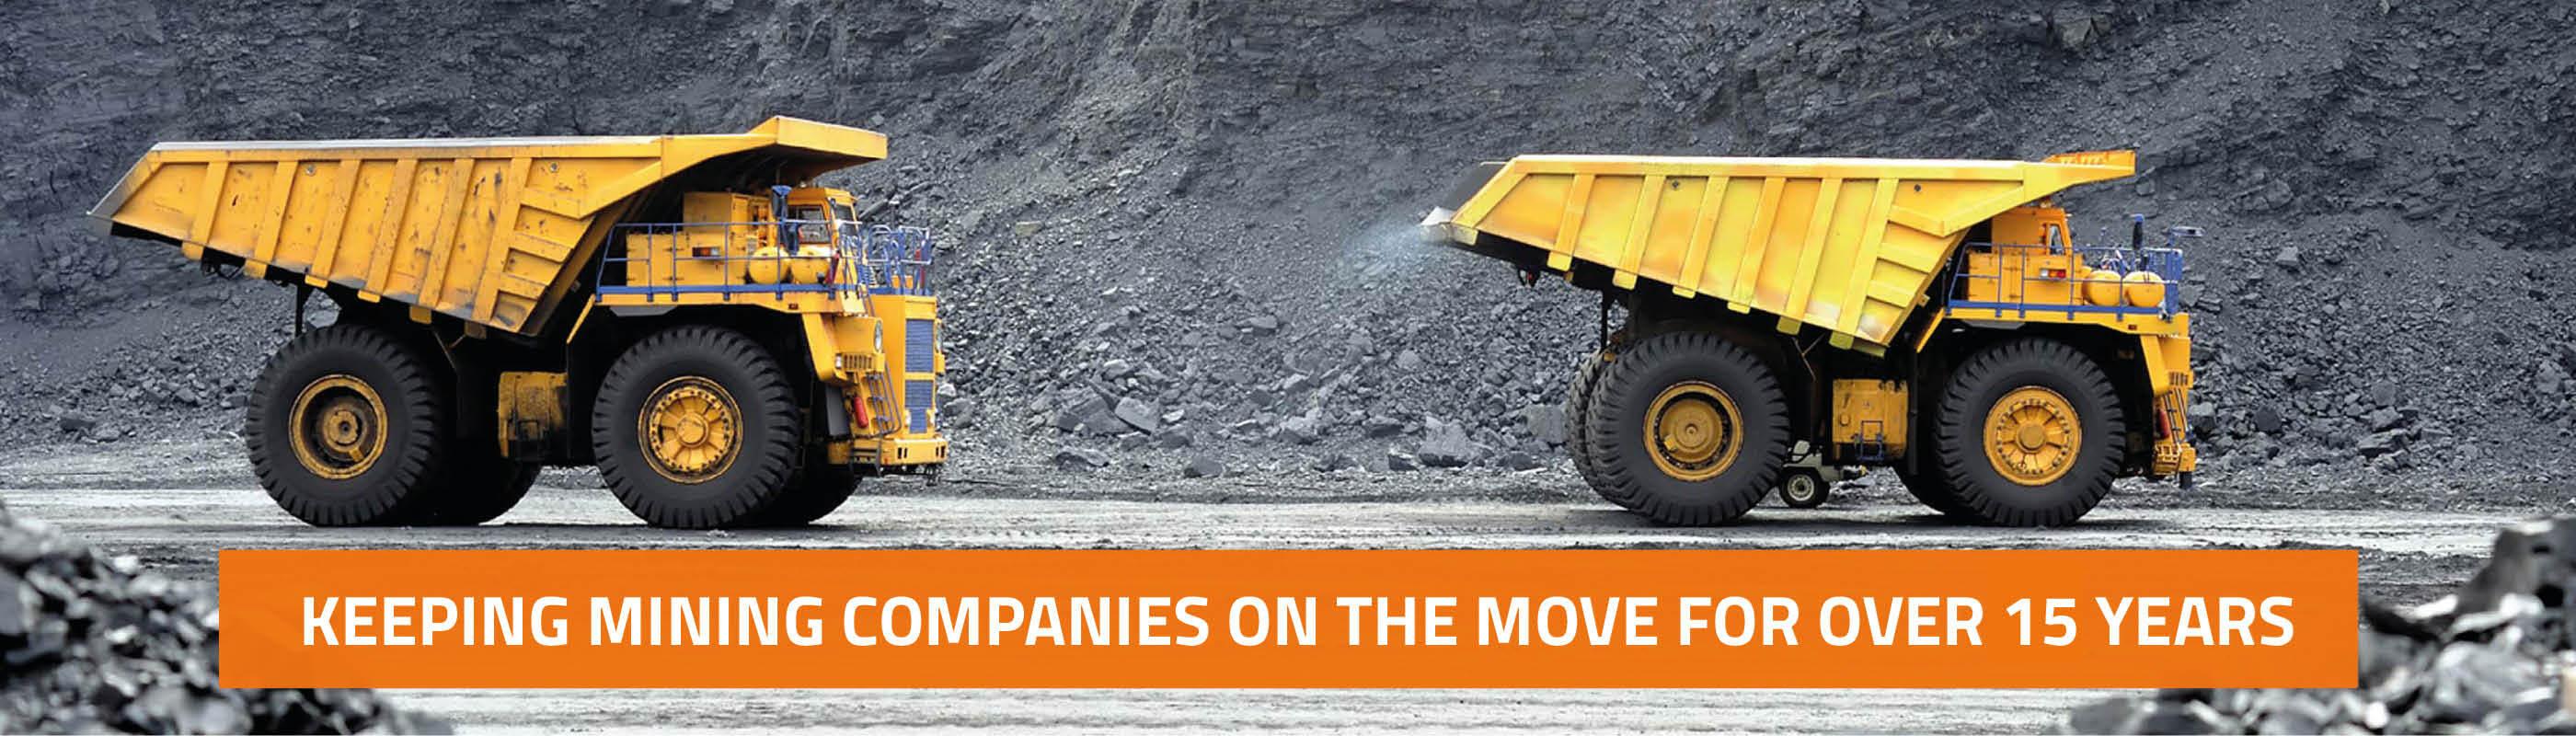 backsafe-mining-homepage-banner